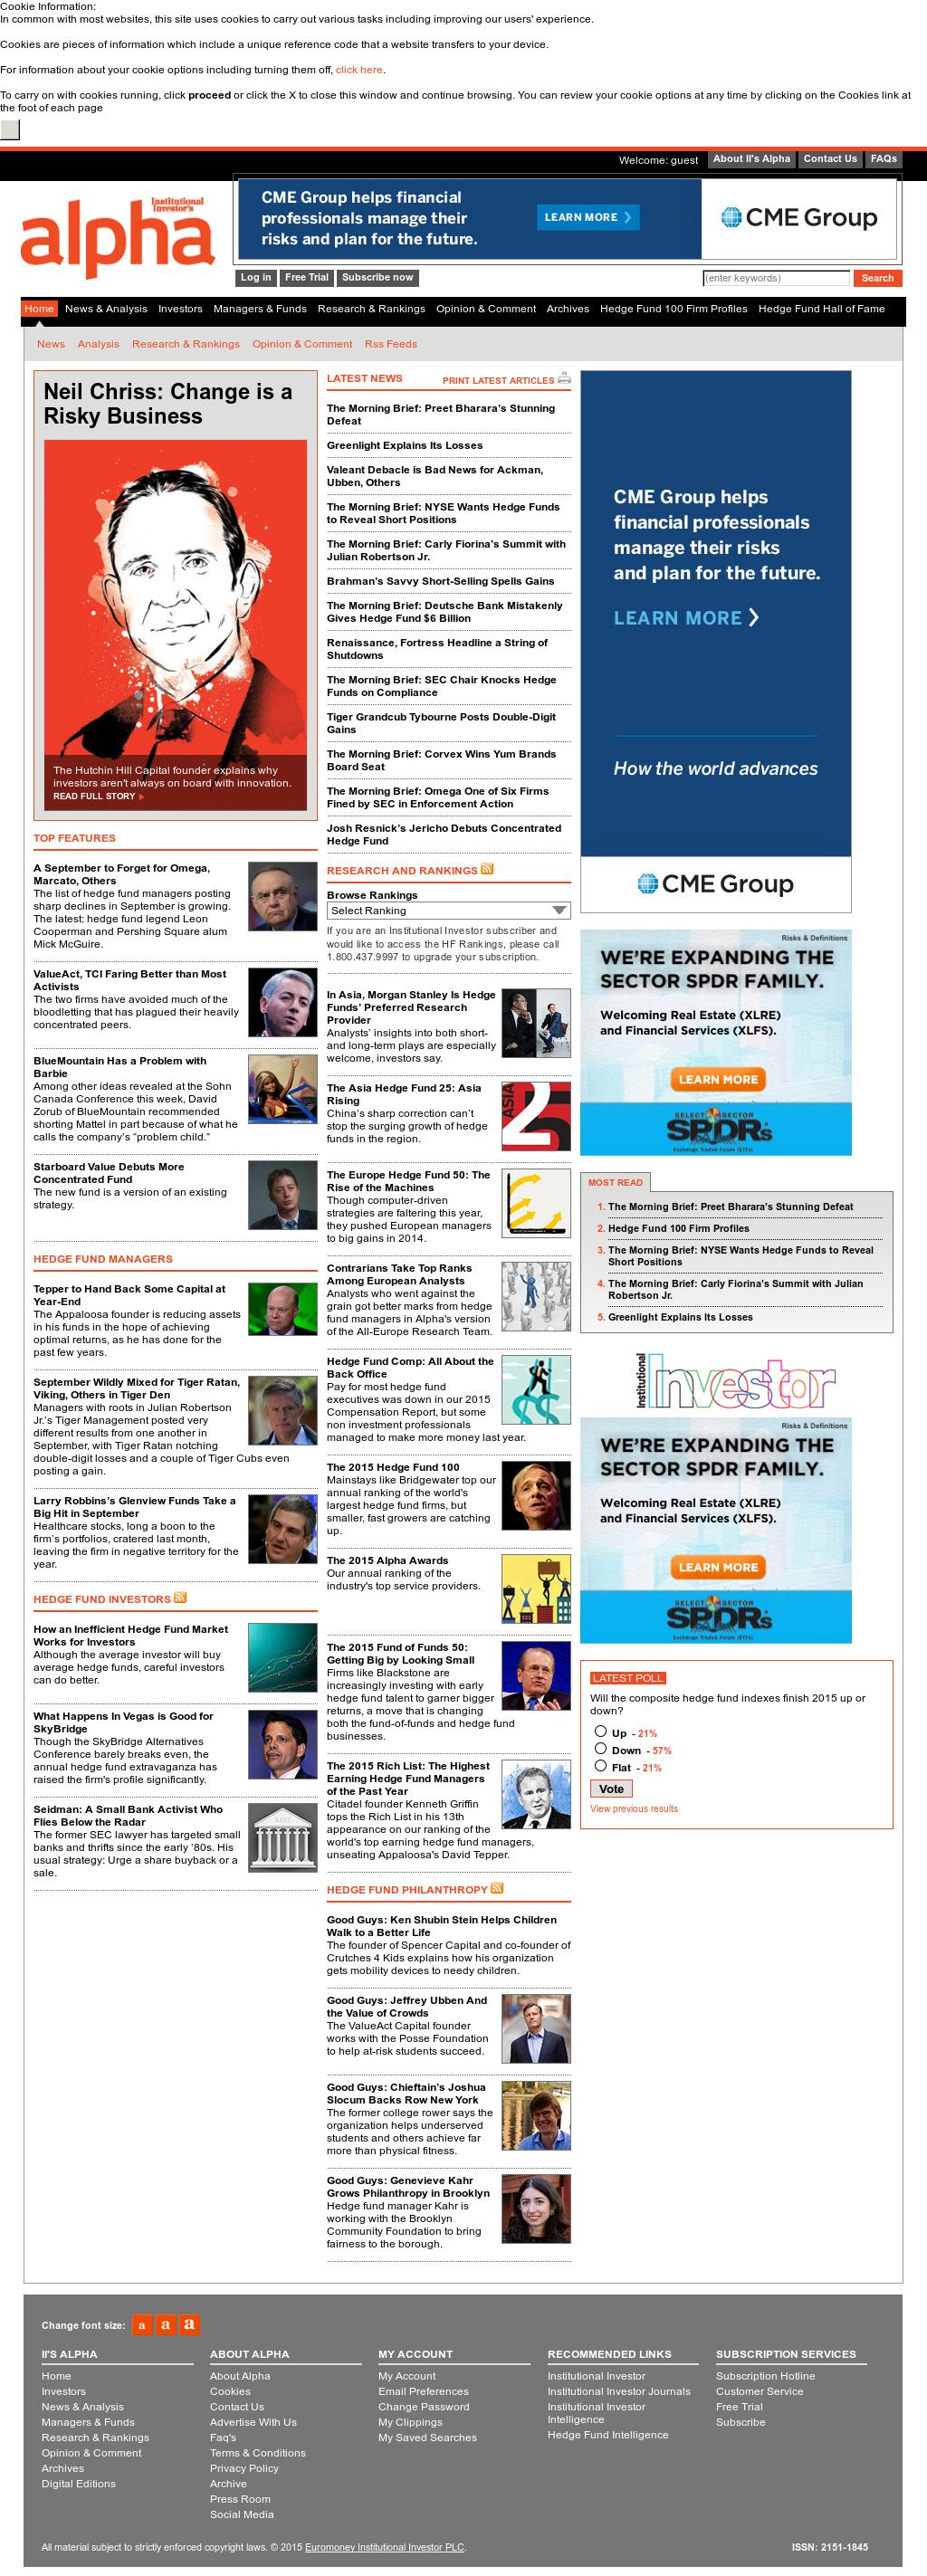 Owler Reports - Press Release: Institutional Investors Alpha : James